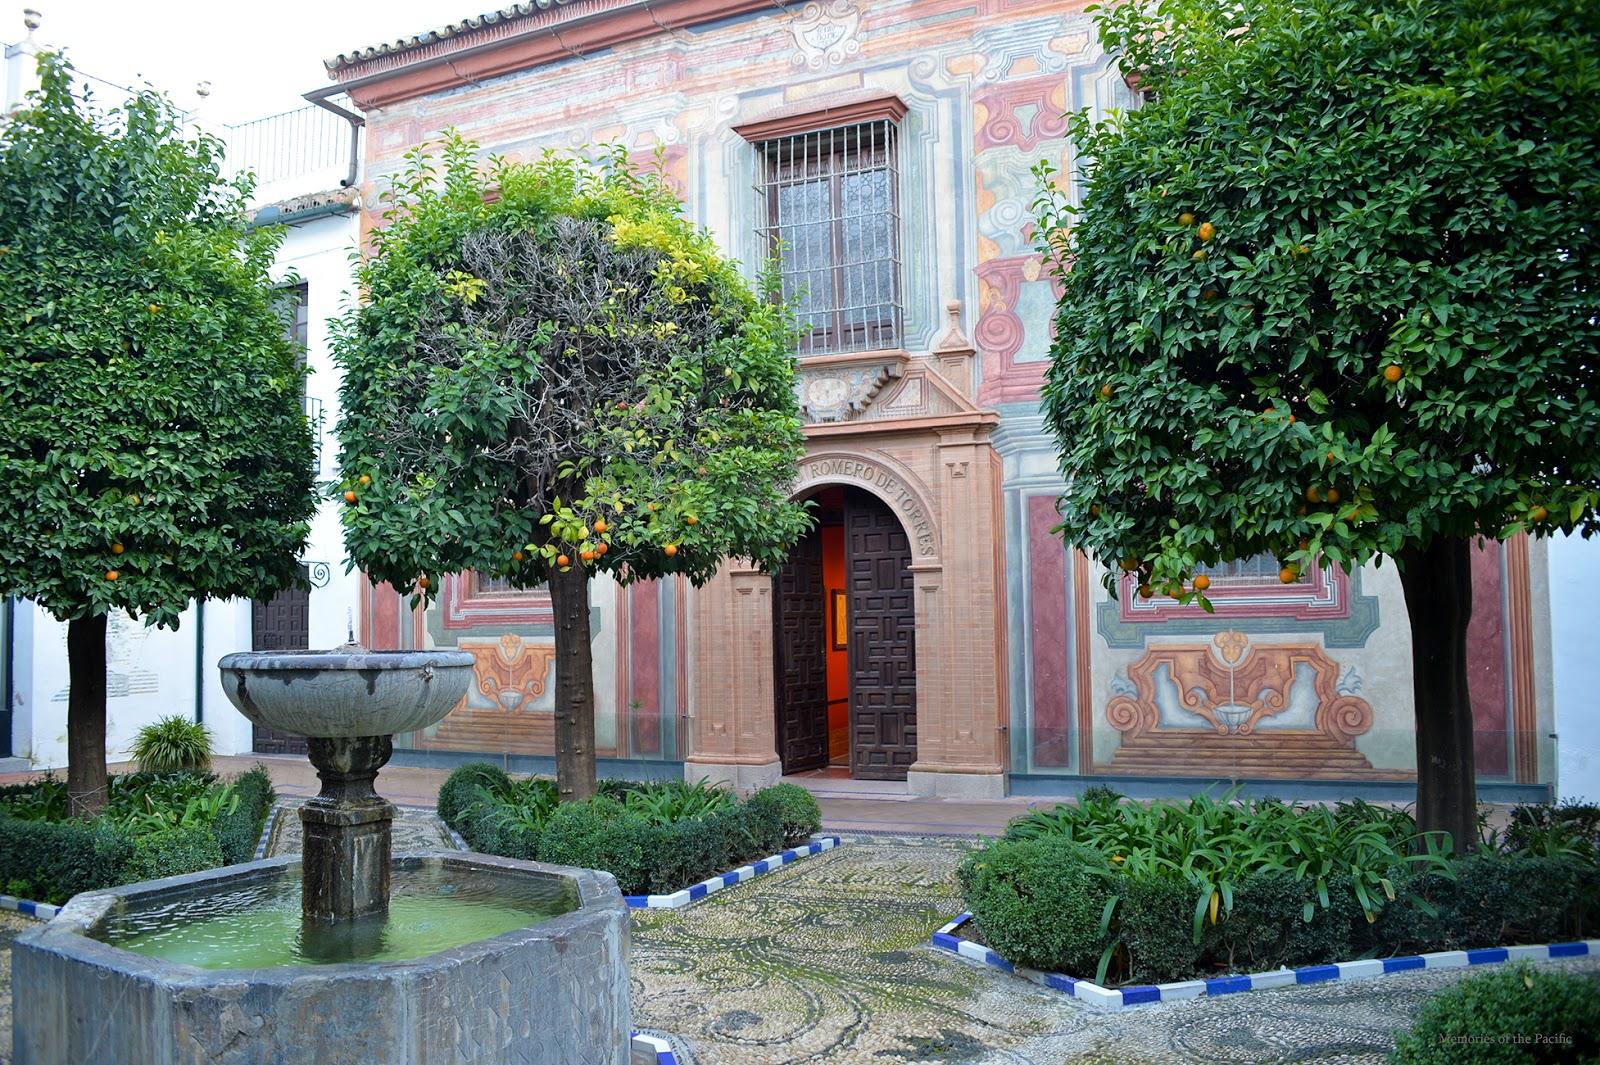 museo romero de torres cordoba